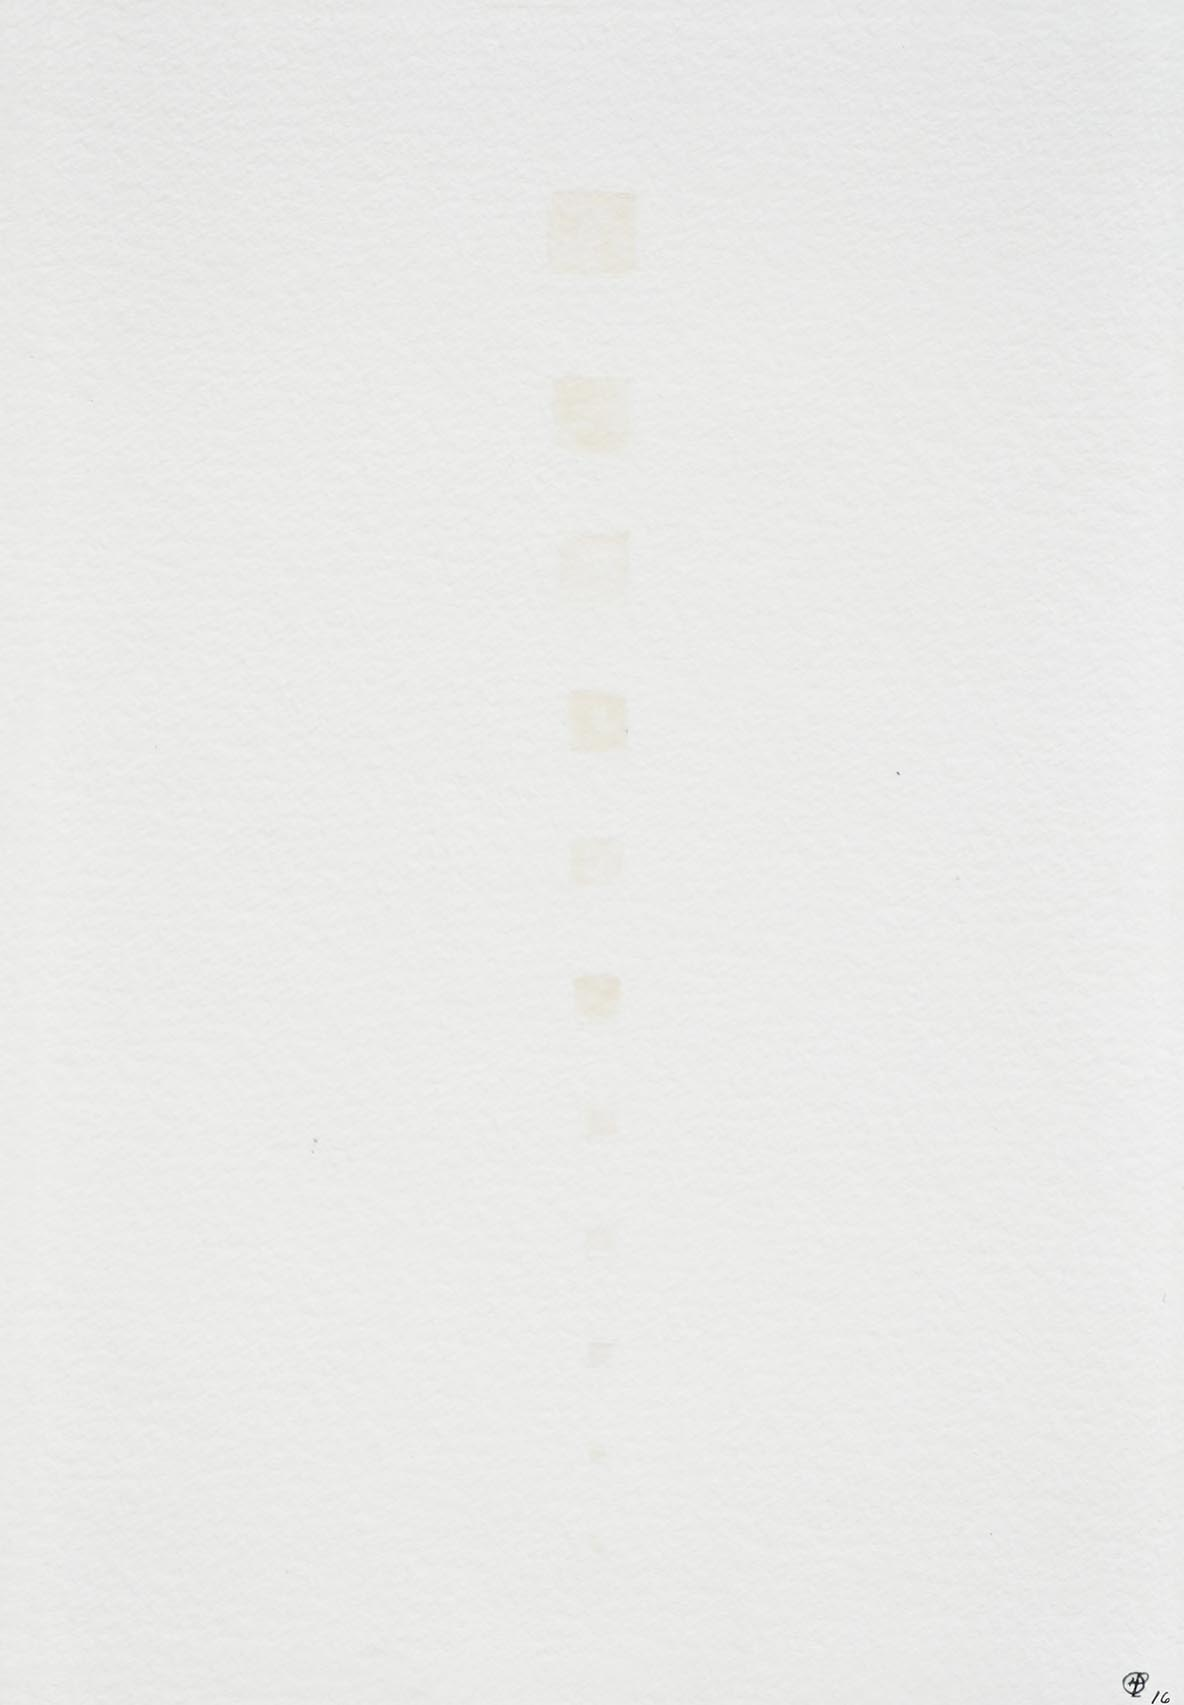 Helene Lundbye Petersen,   Graspable Beginning Appearing,   2016, Work on Paper, Watercolour, paper, 14.8 × 21 cm. ( Comprehension Studies   1/6)